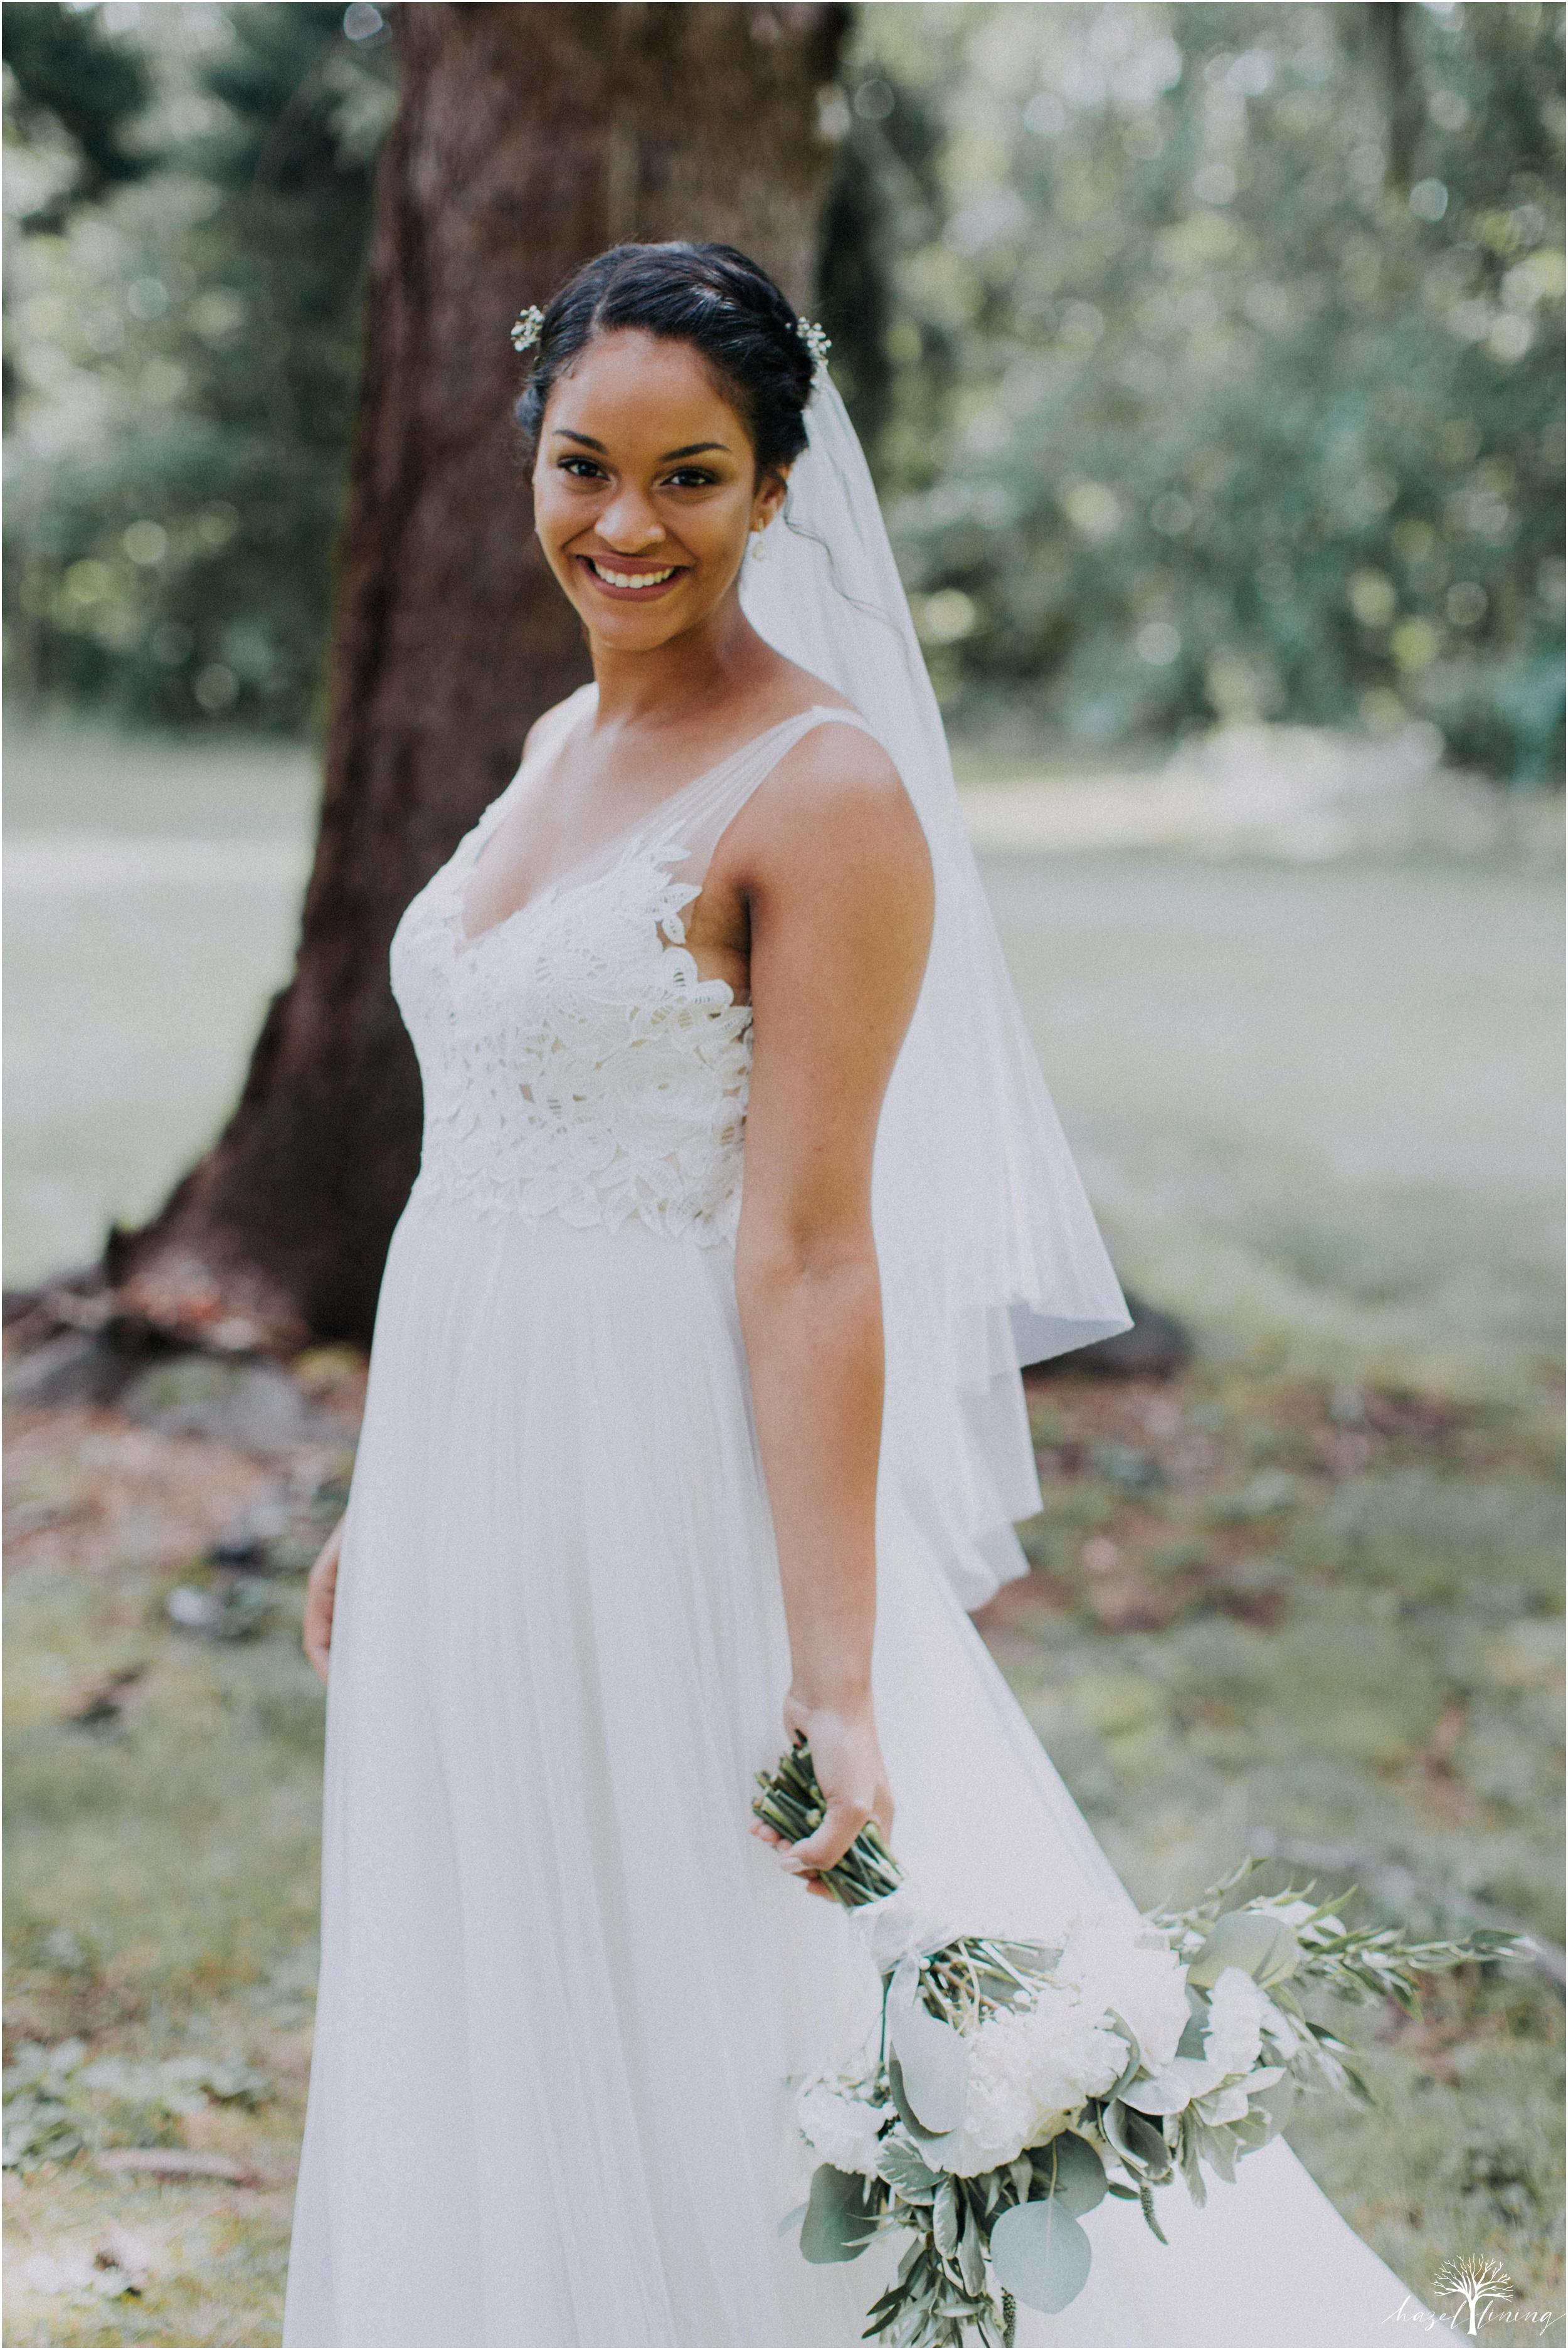 mariah-kreyling-samuel-sherratt-sherrattwiththeworld-peirce-farm-at-witch-hill-boston-massachusetts-wedding-photography-hazel-lining-travel-wedding-elopement-photography_0045.jpg